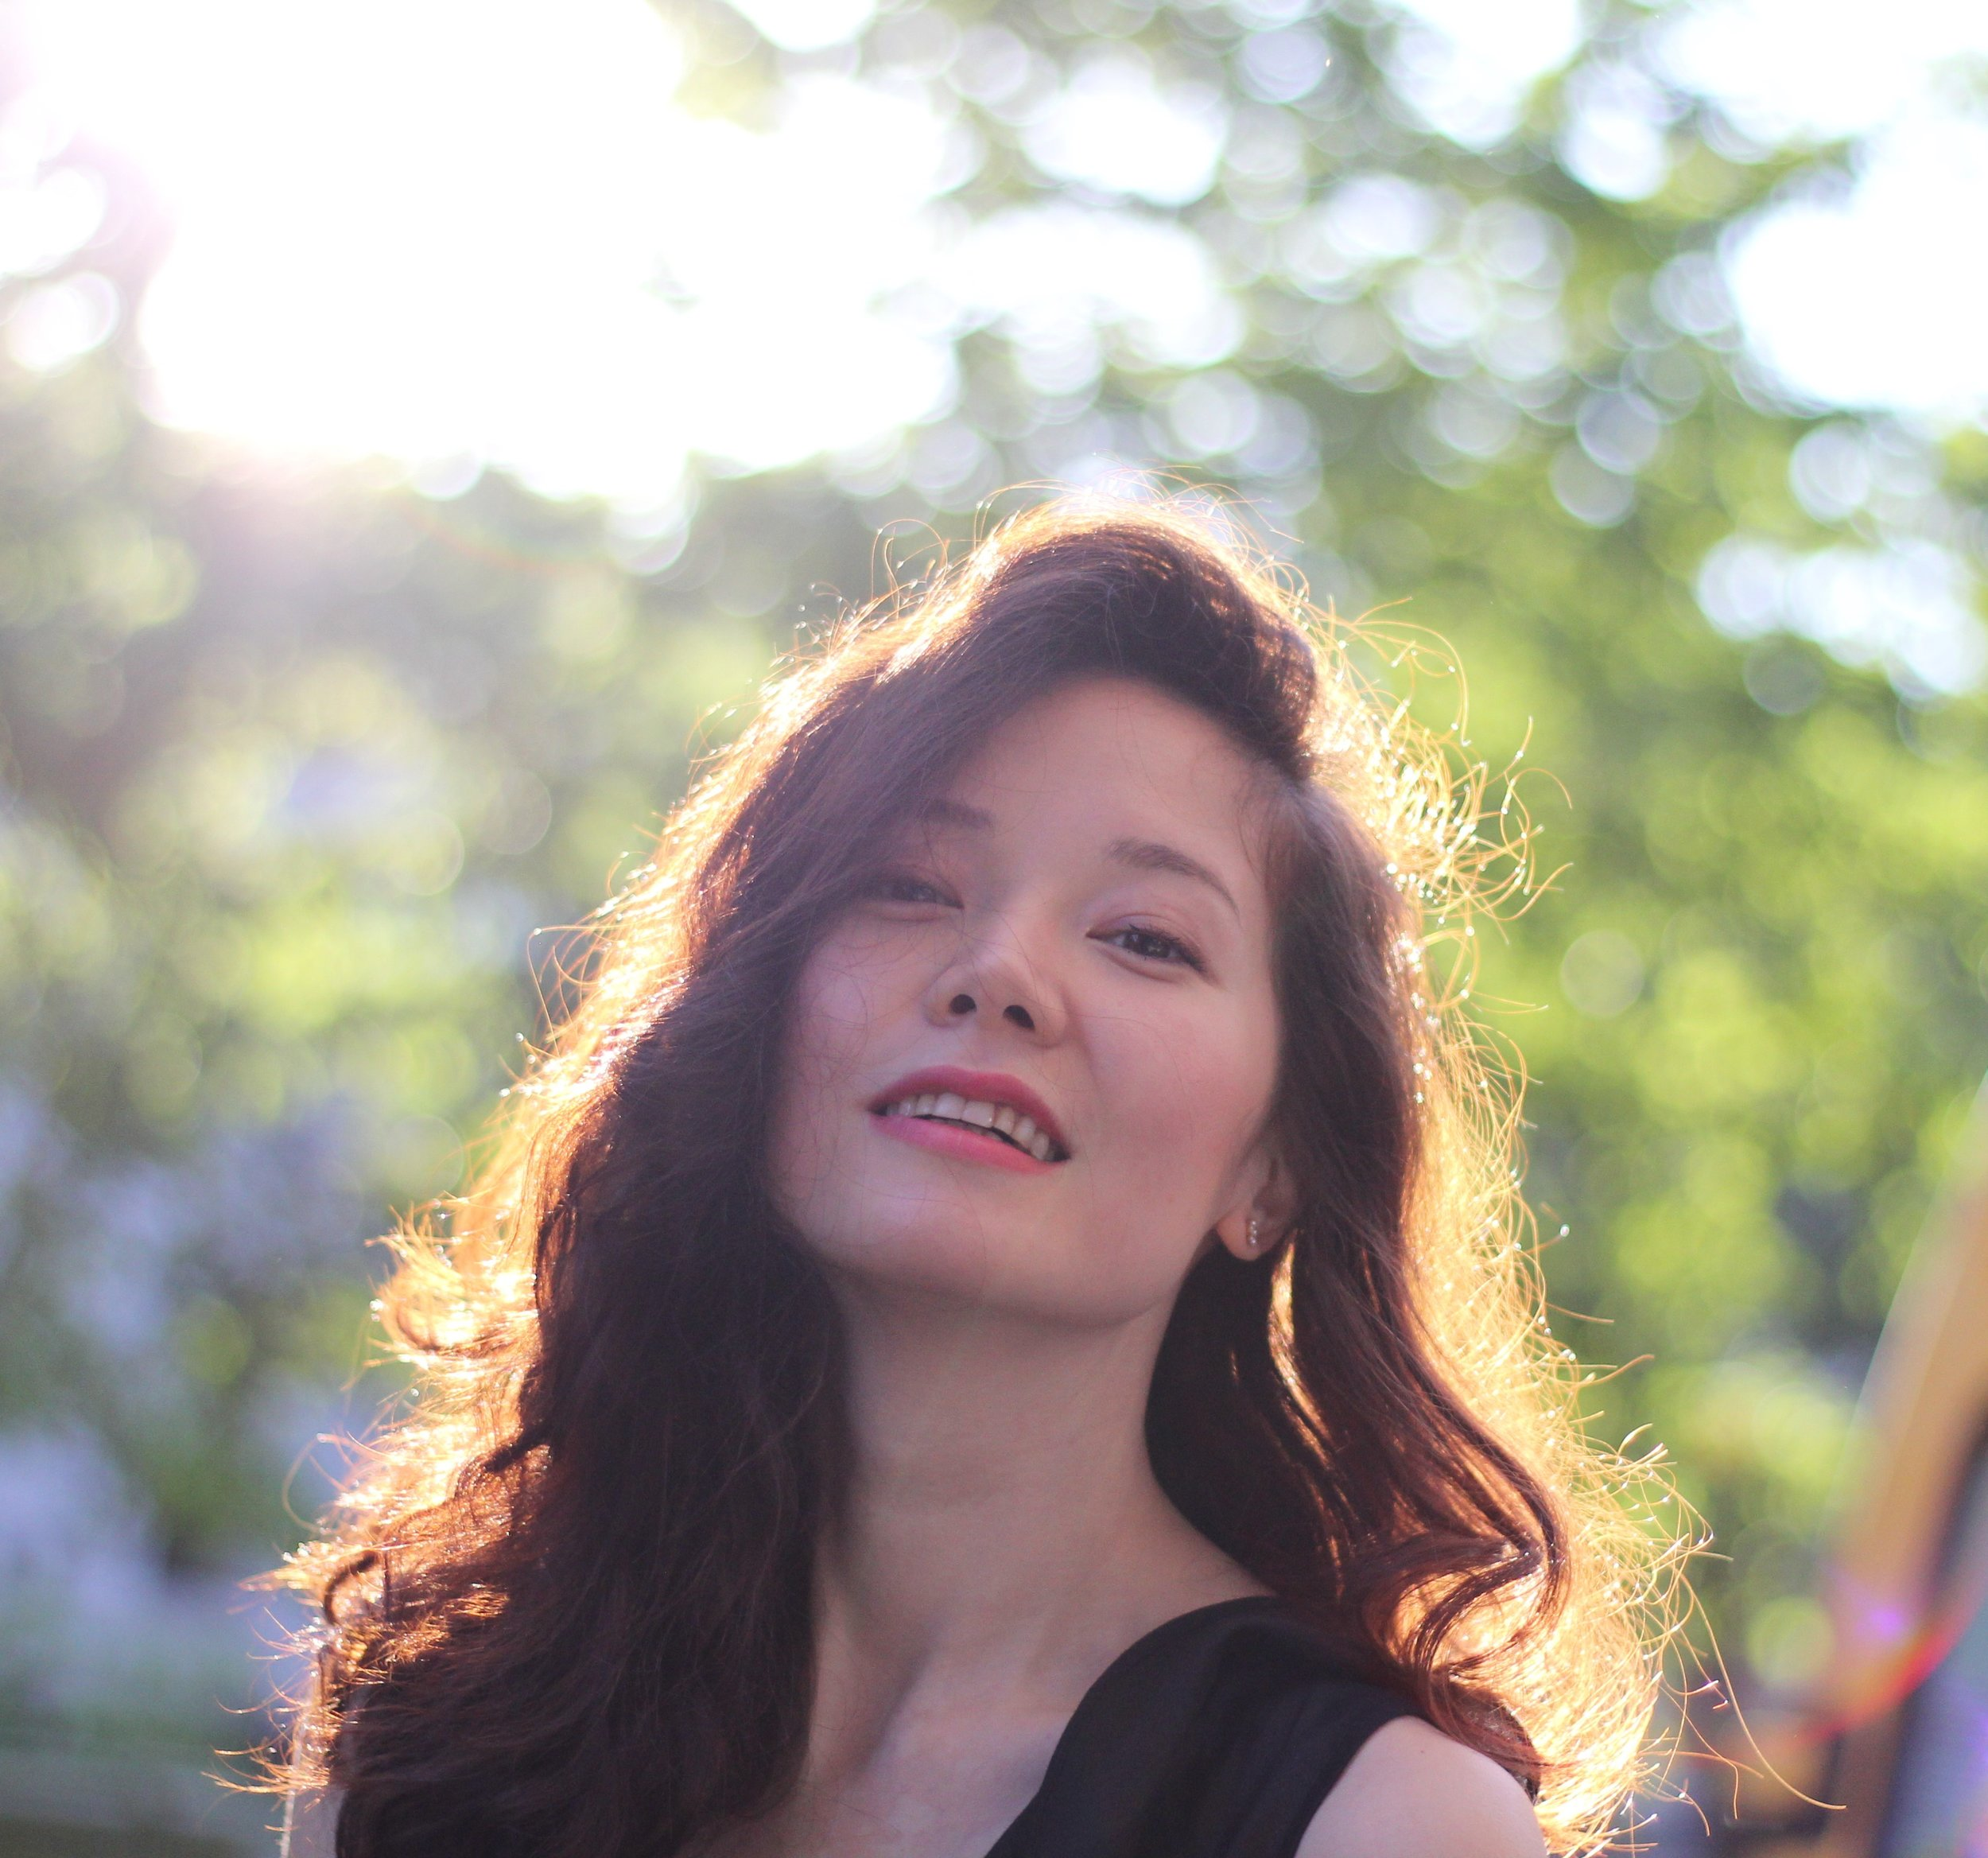 Anara Khassenova